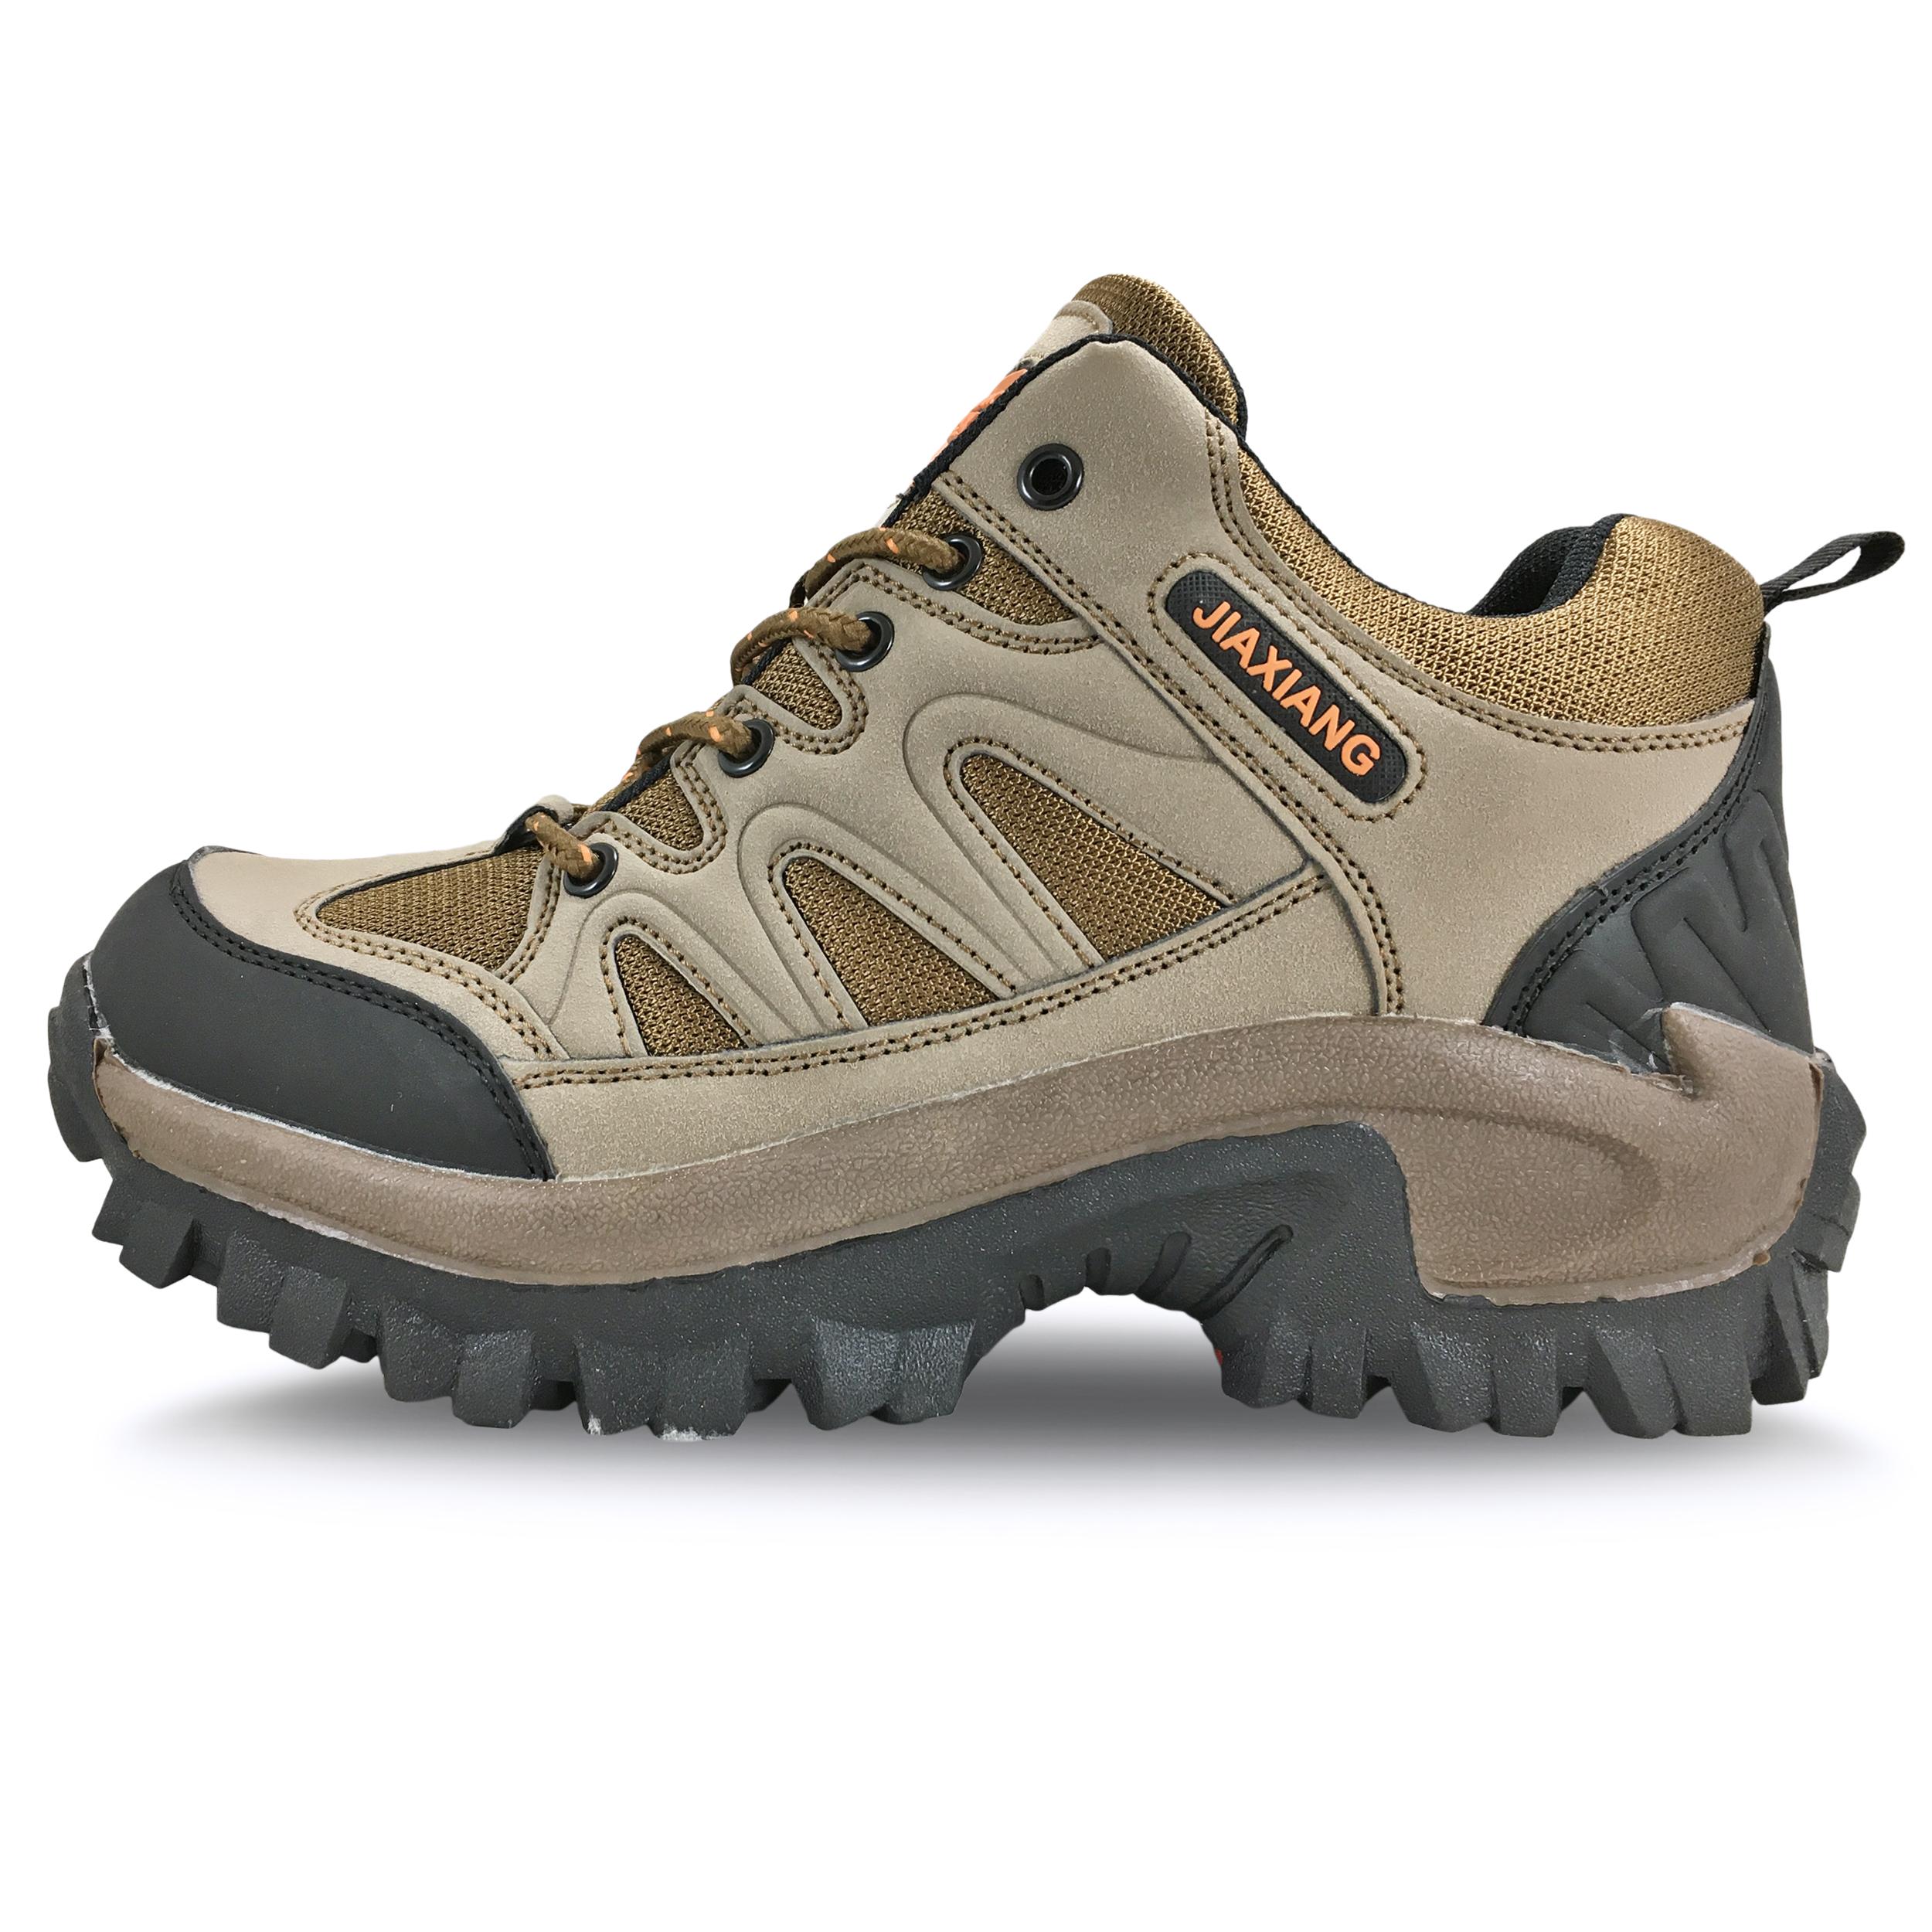 قیمت کفش کوهنوردی مردانه جیاکسیانگ کد SJ104